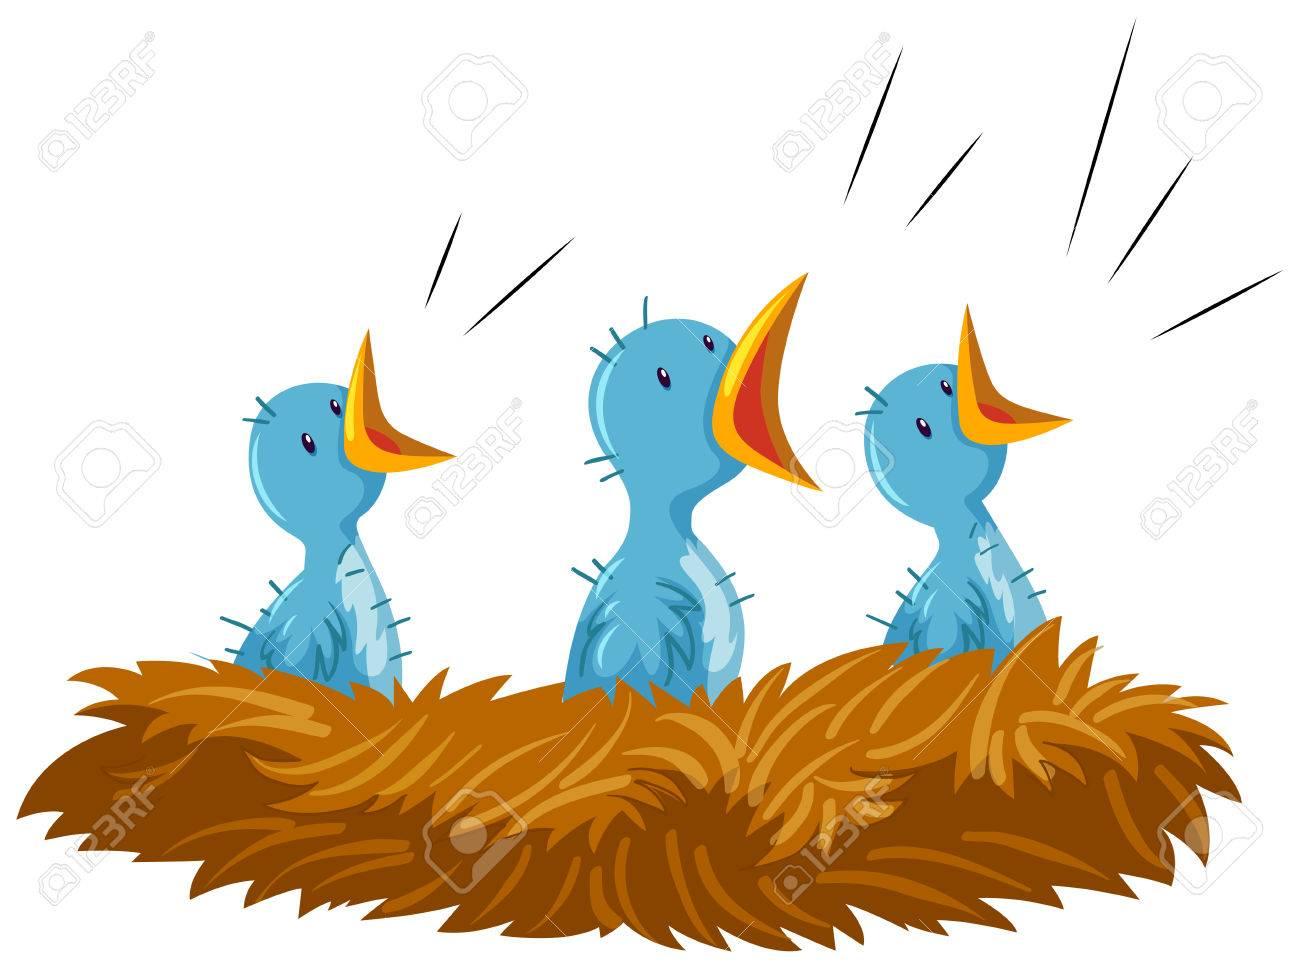 Three baby birds in nest illustration.